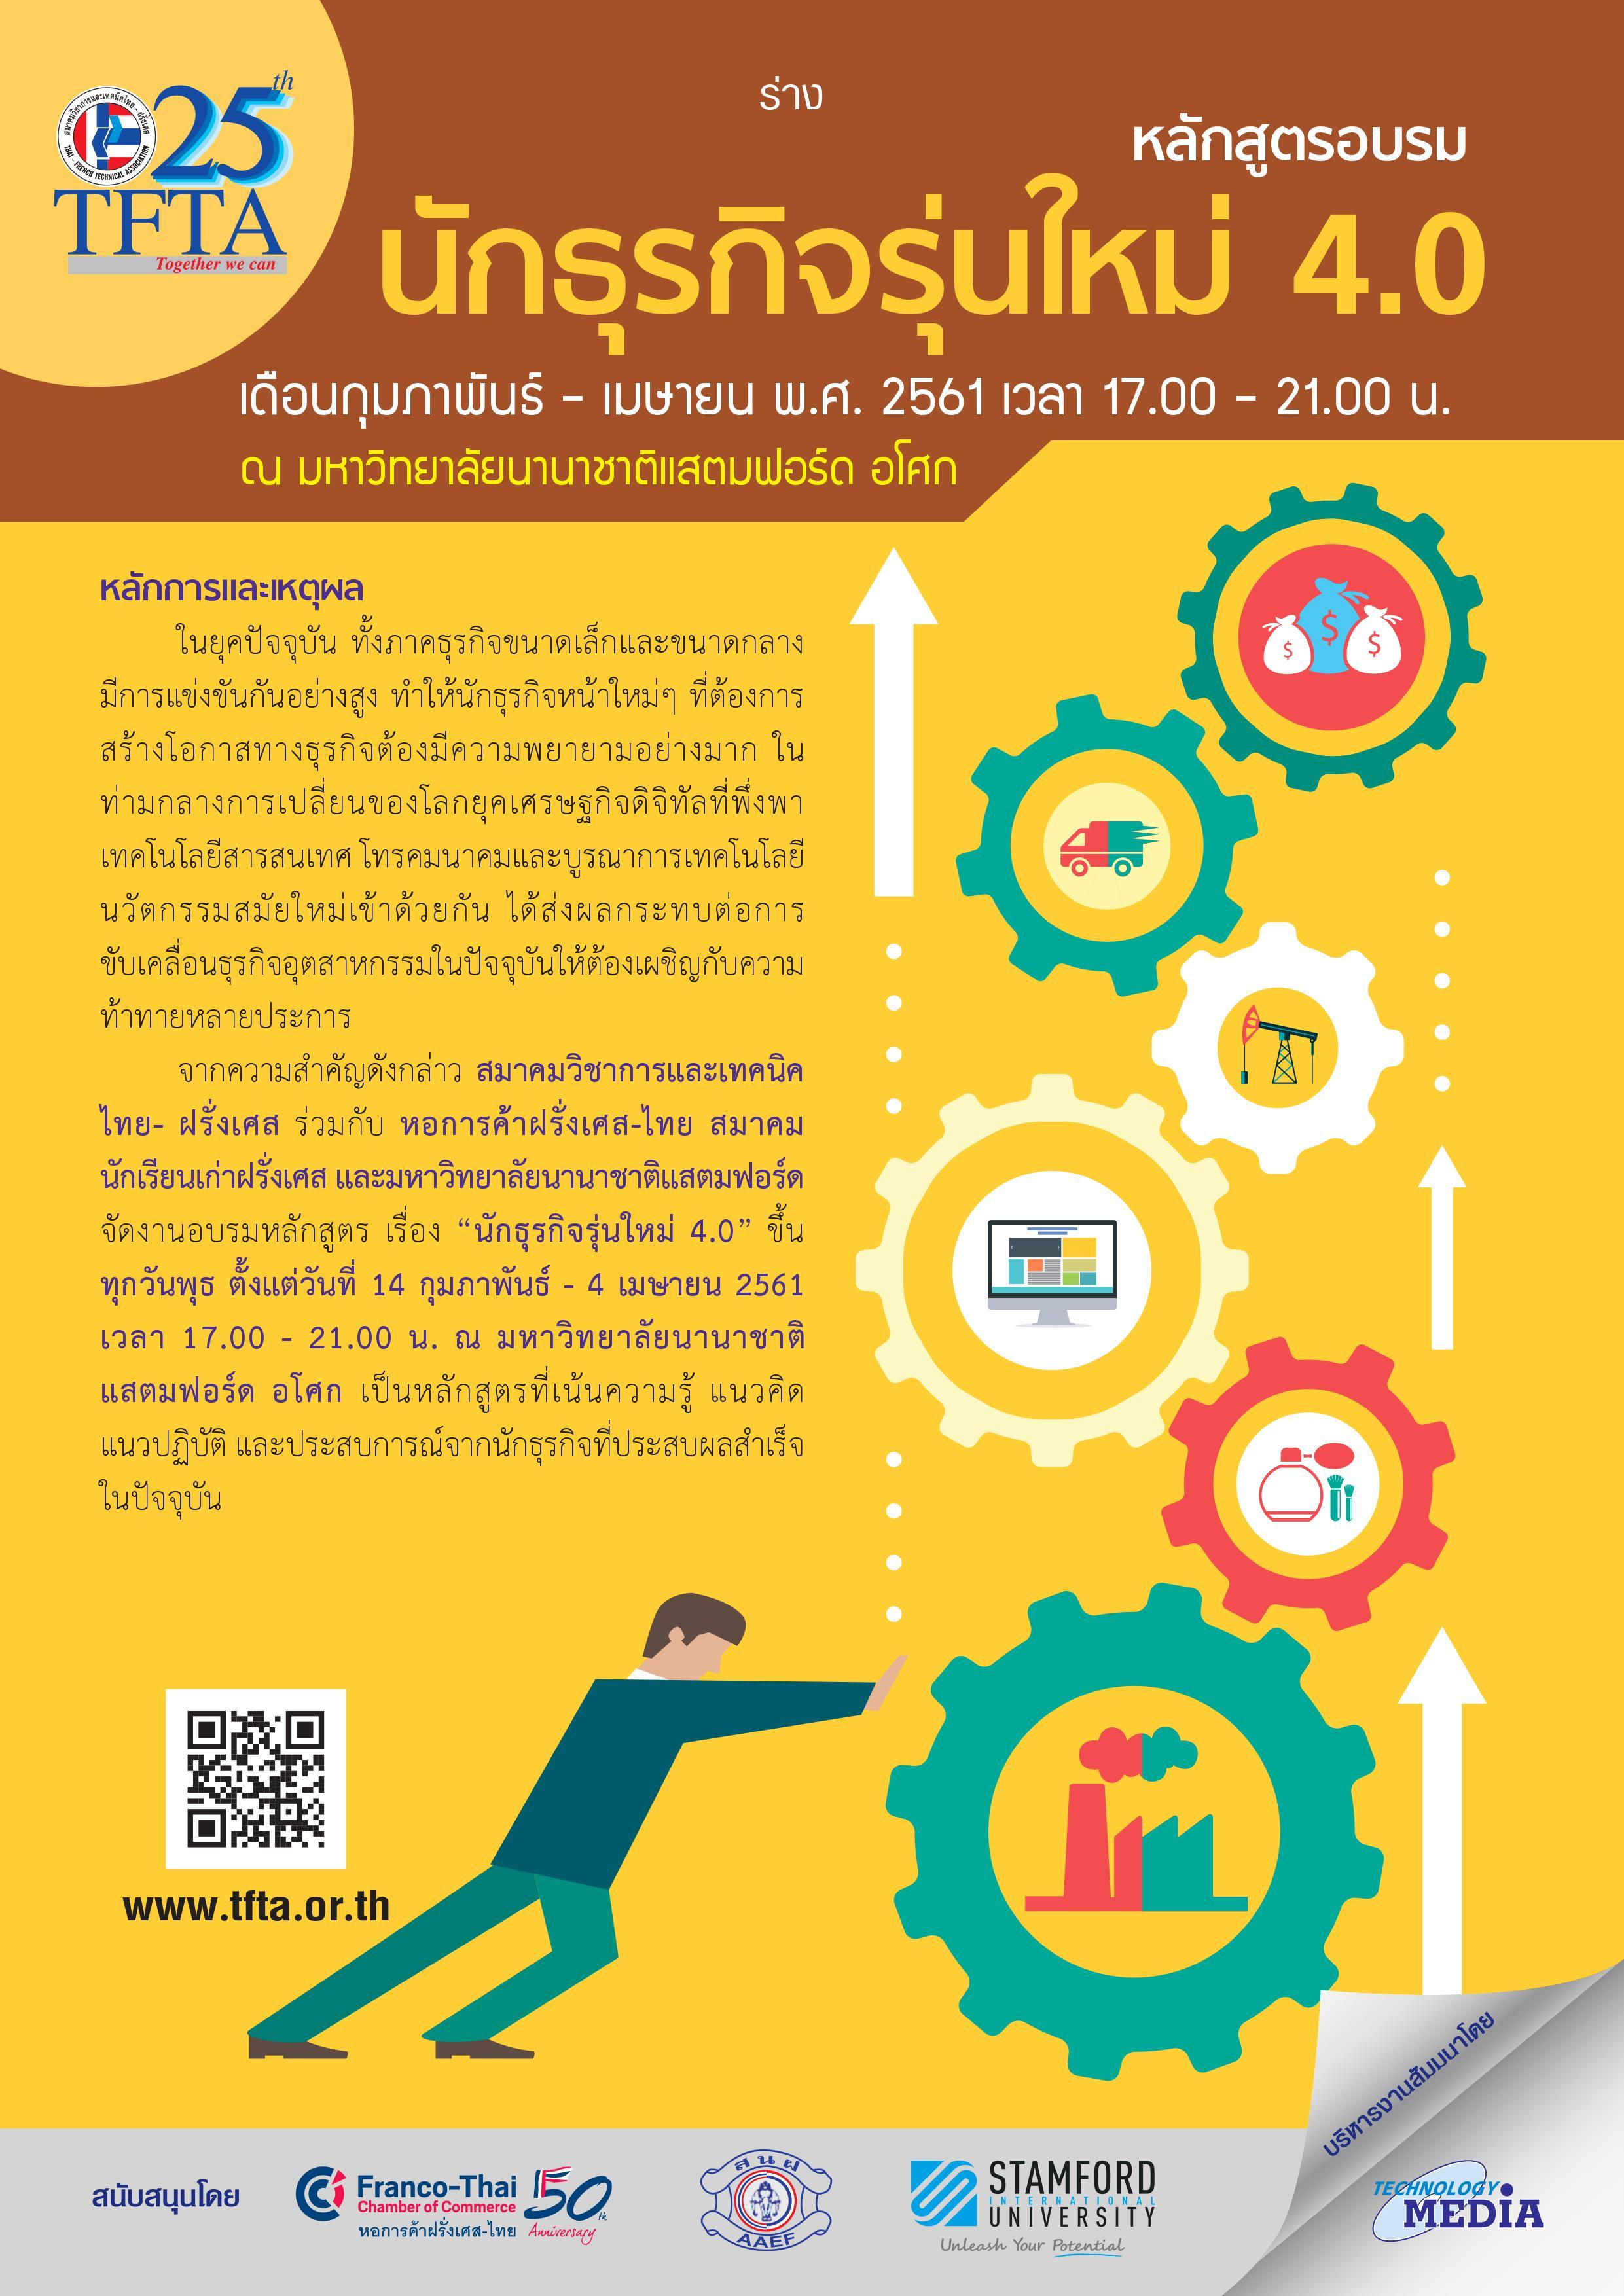 New Entrepreneur 4.0 Training Course